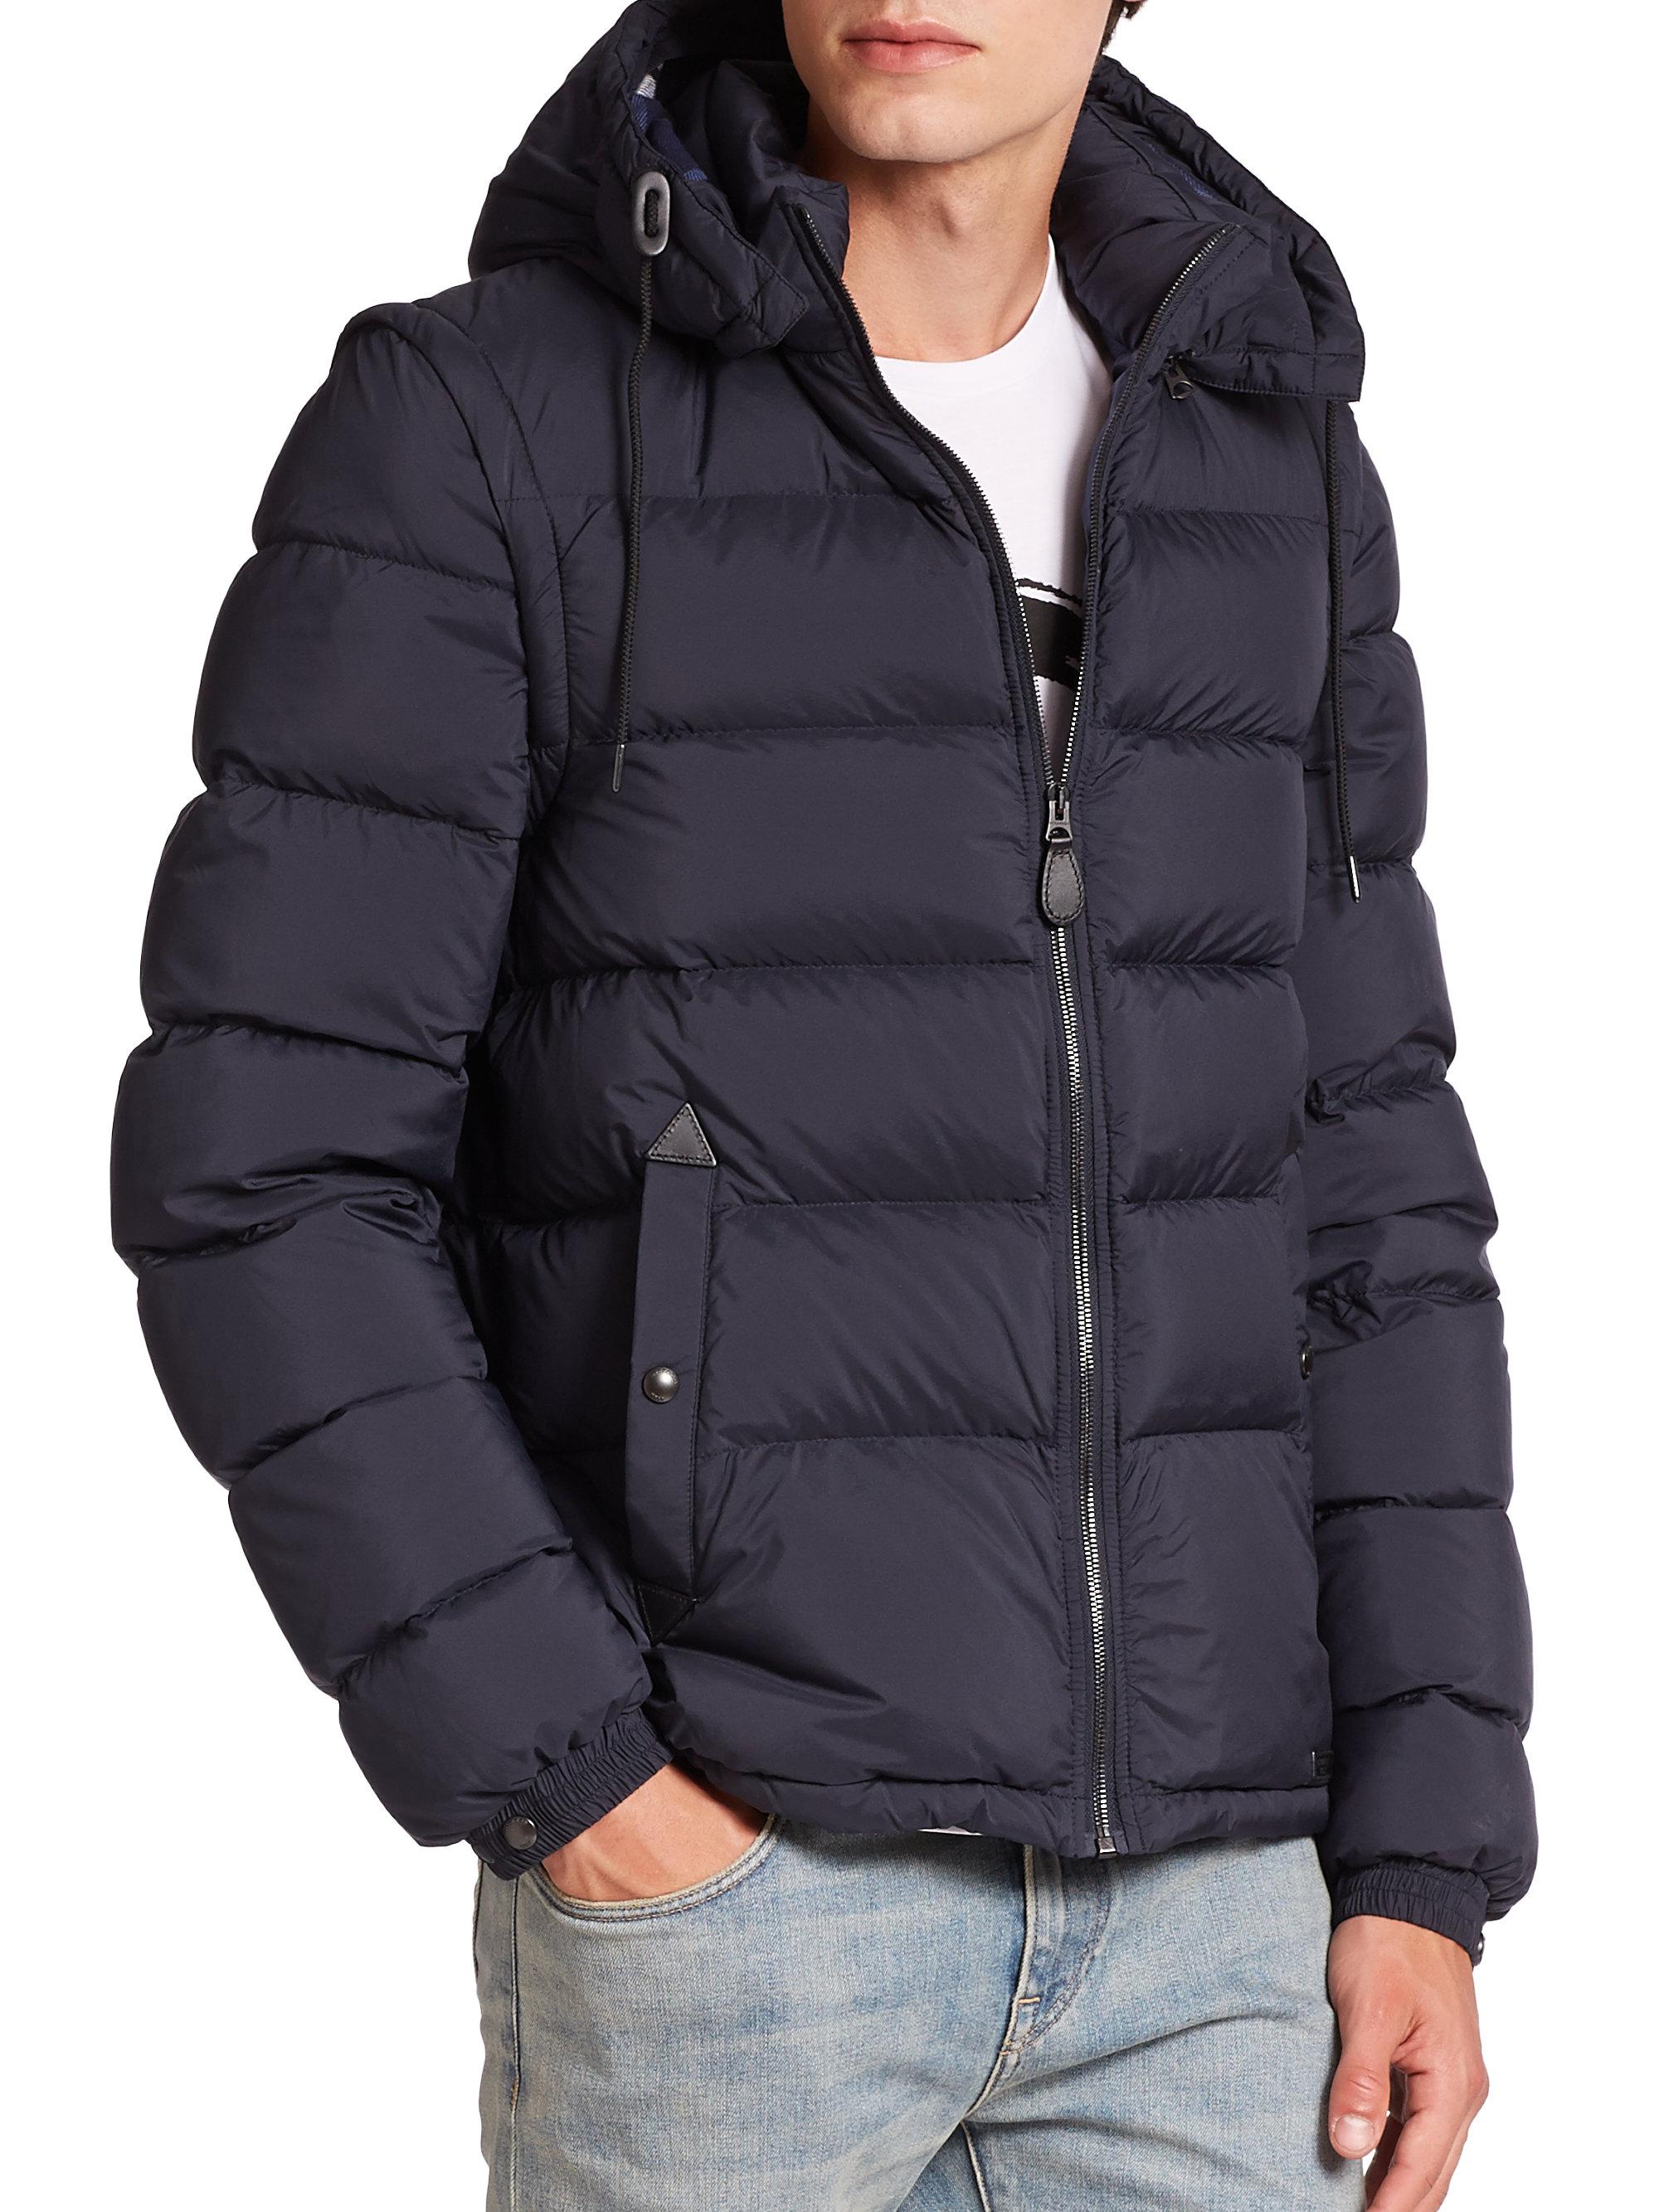 d507f07c47e Burberry Hooded Jacket Black